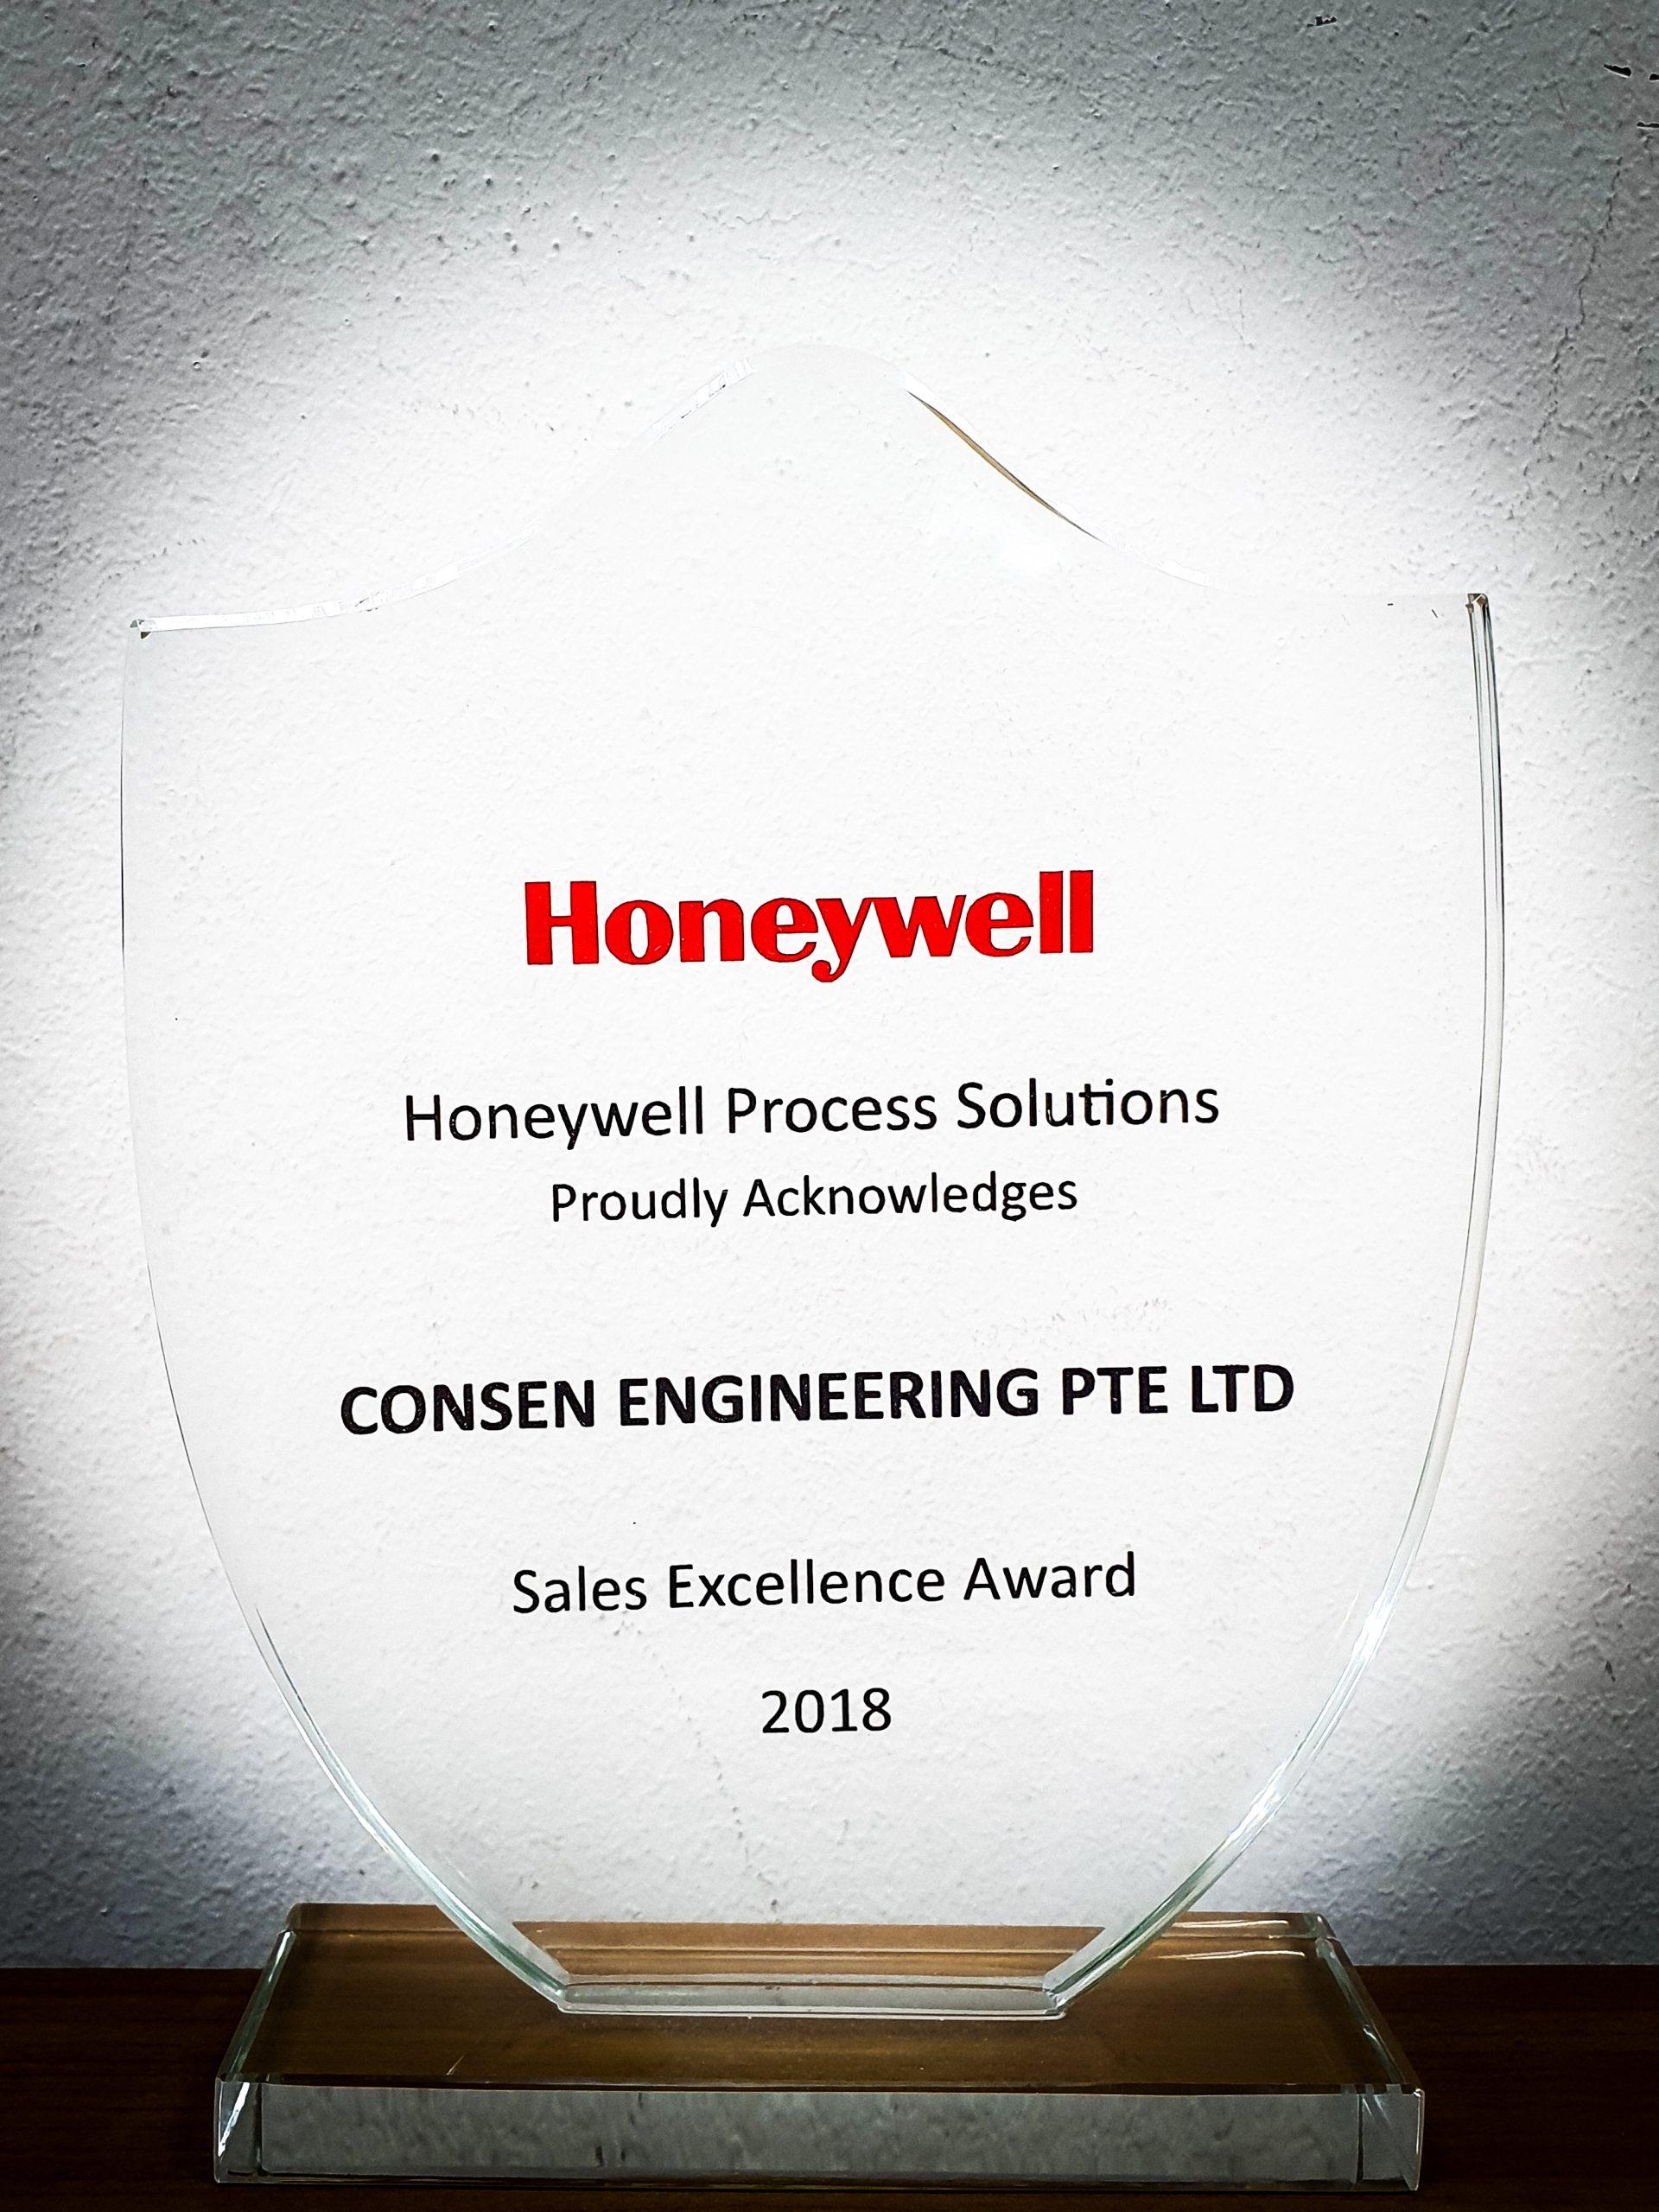 Consen Engineering Pte. Ltd.